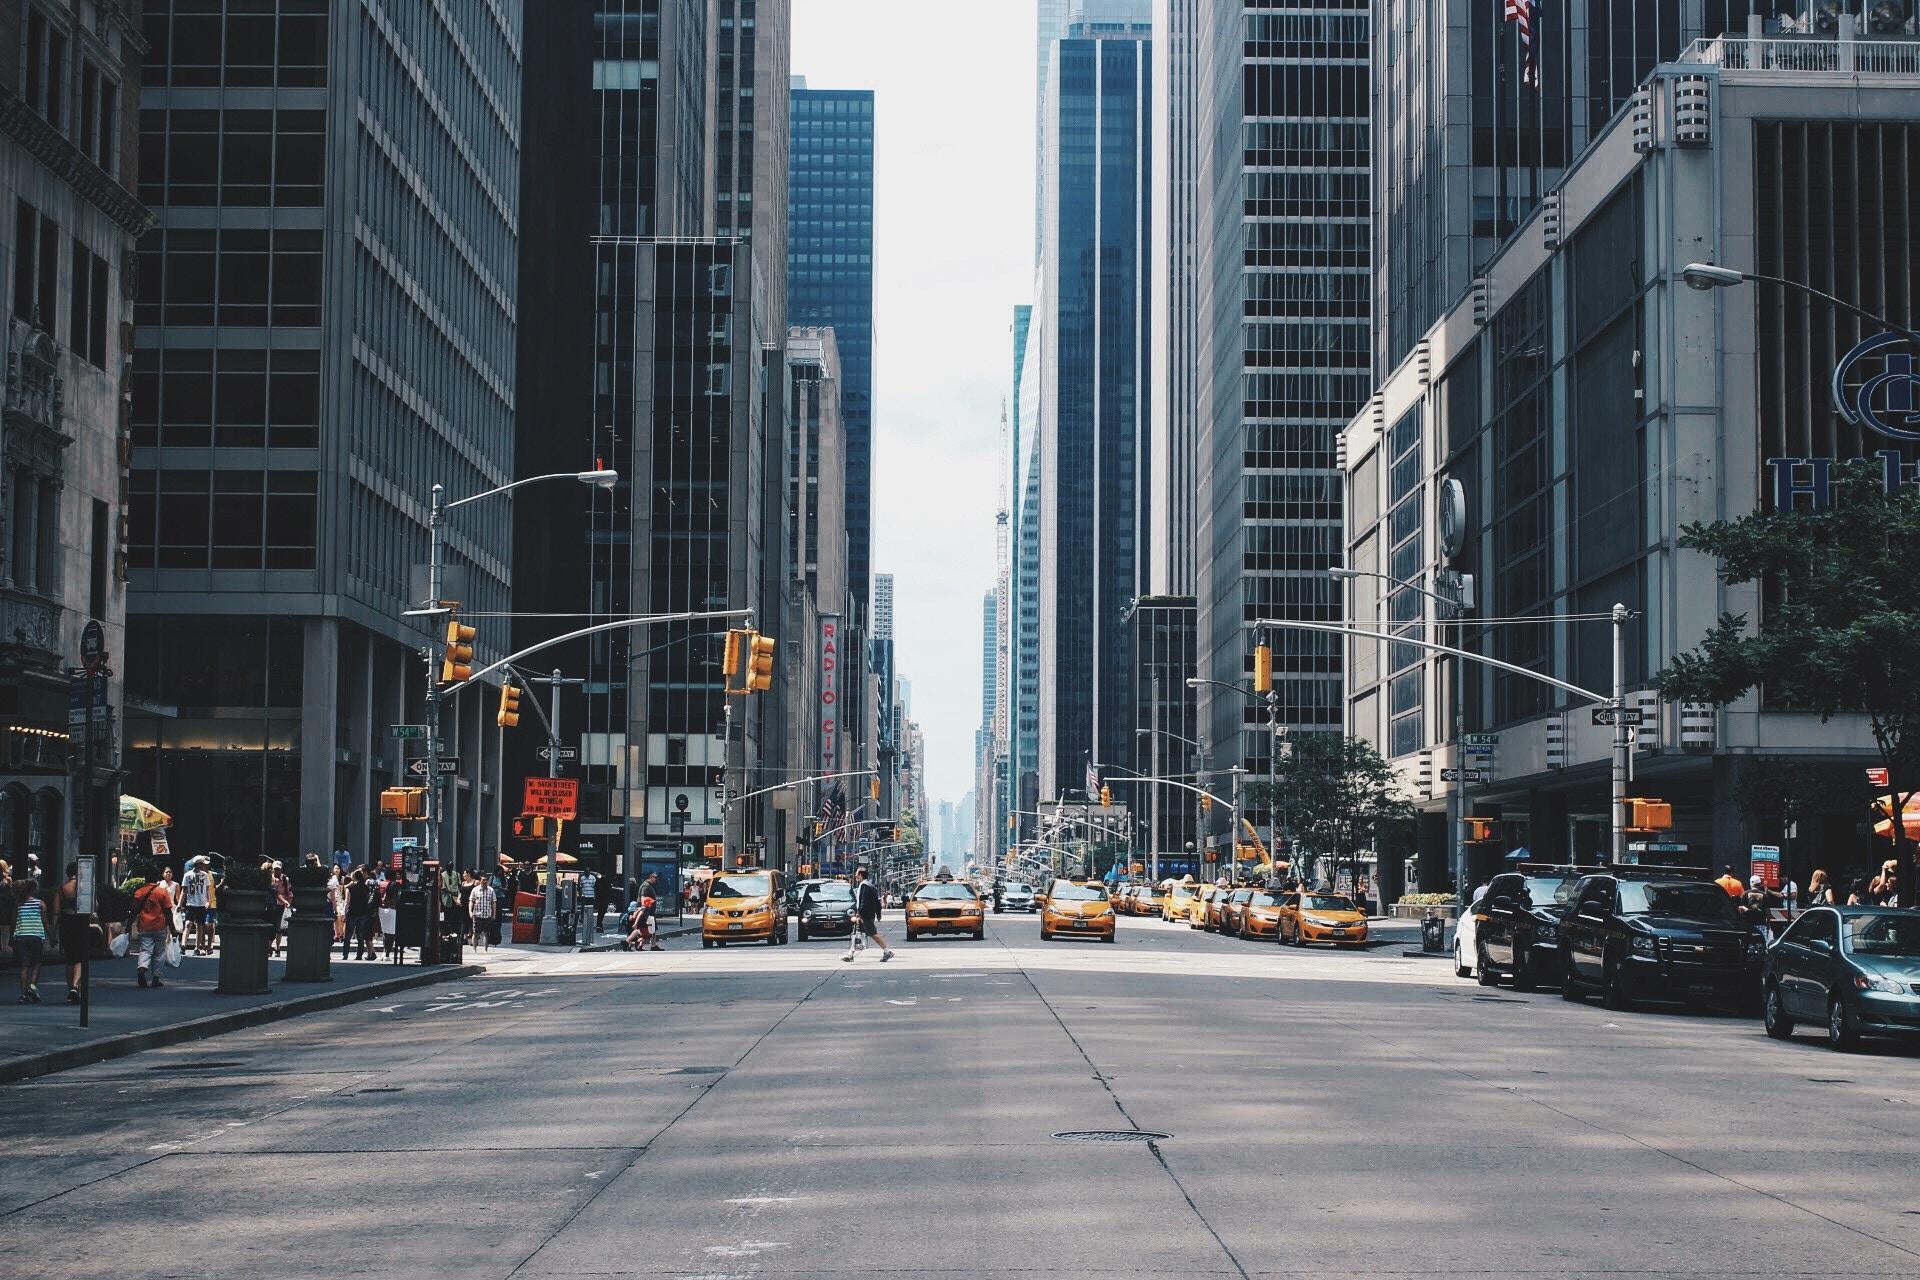 NYC, New York city, New York